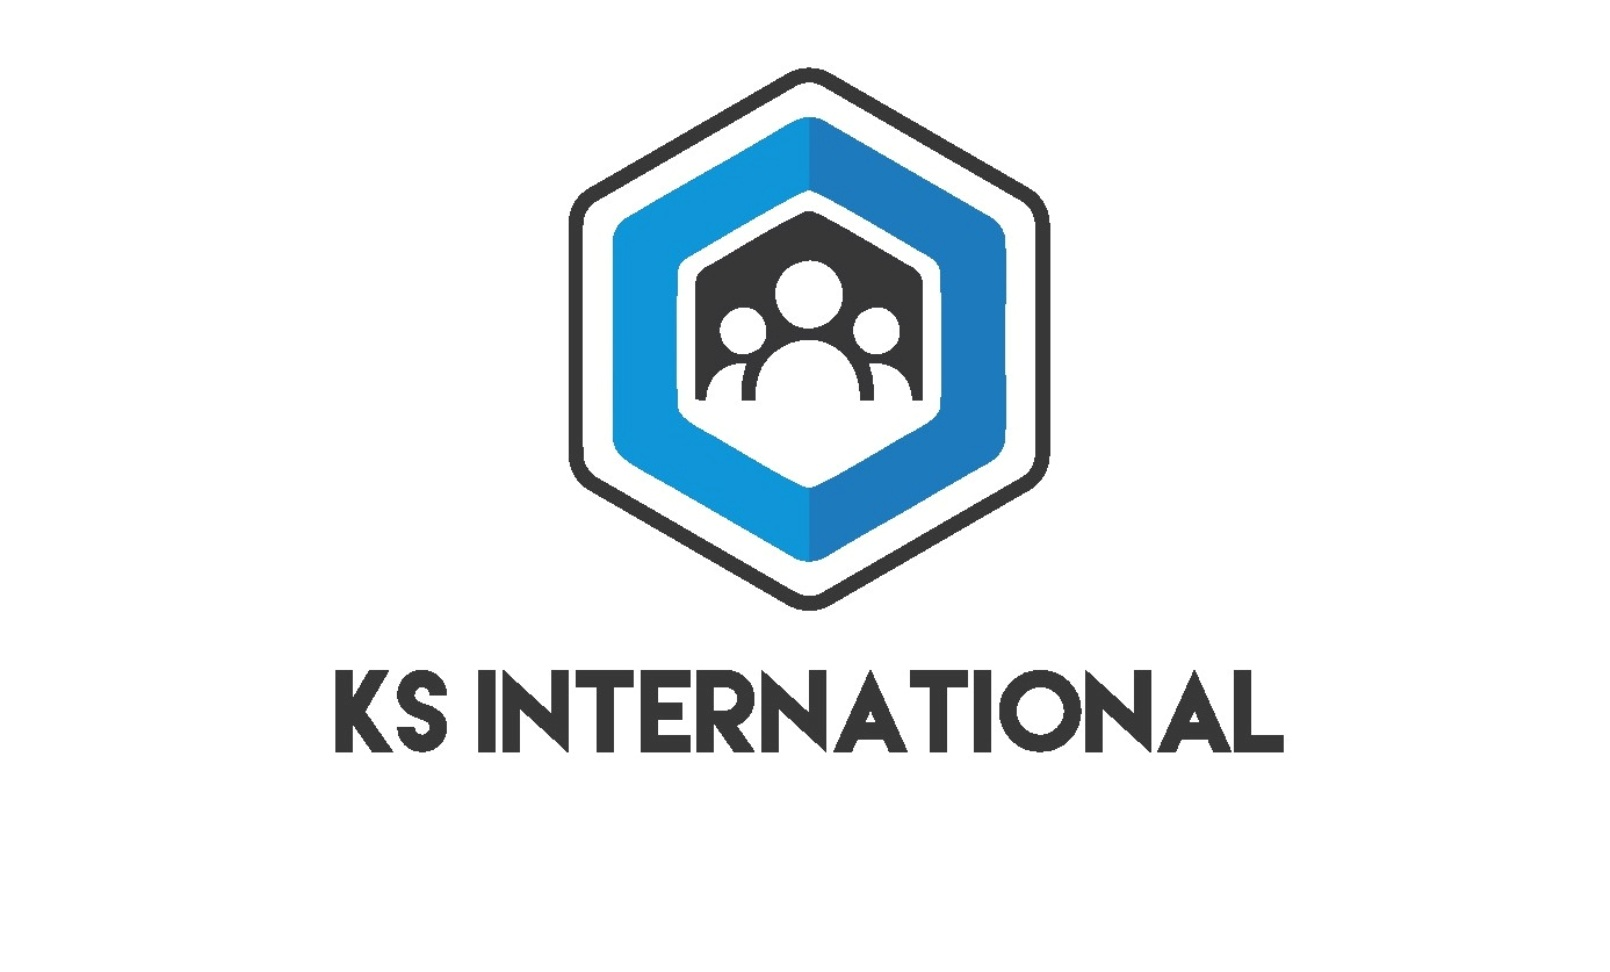 Ks-international